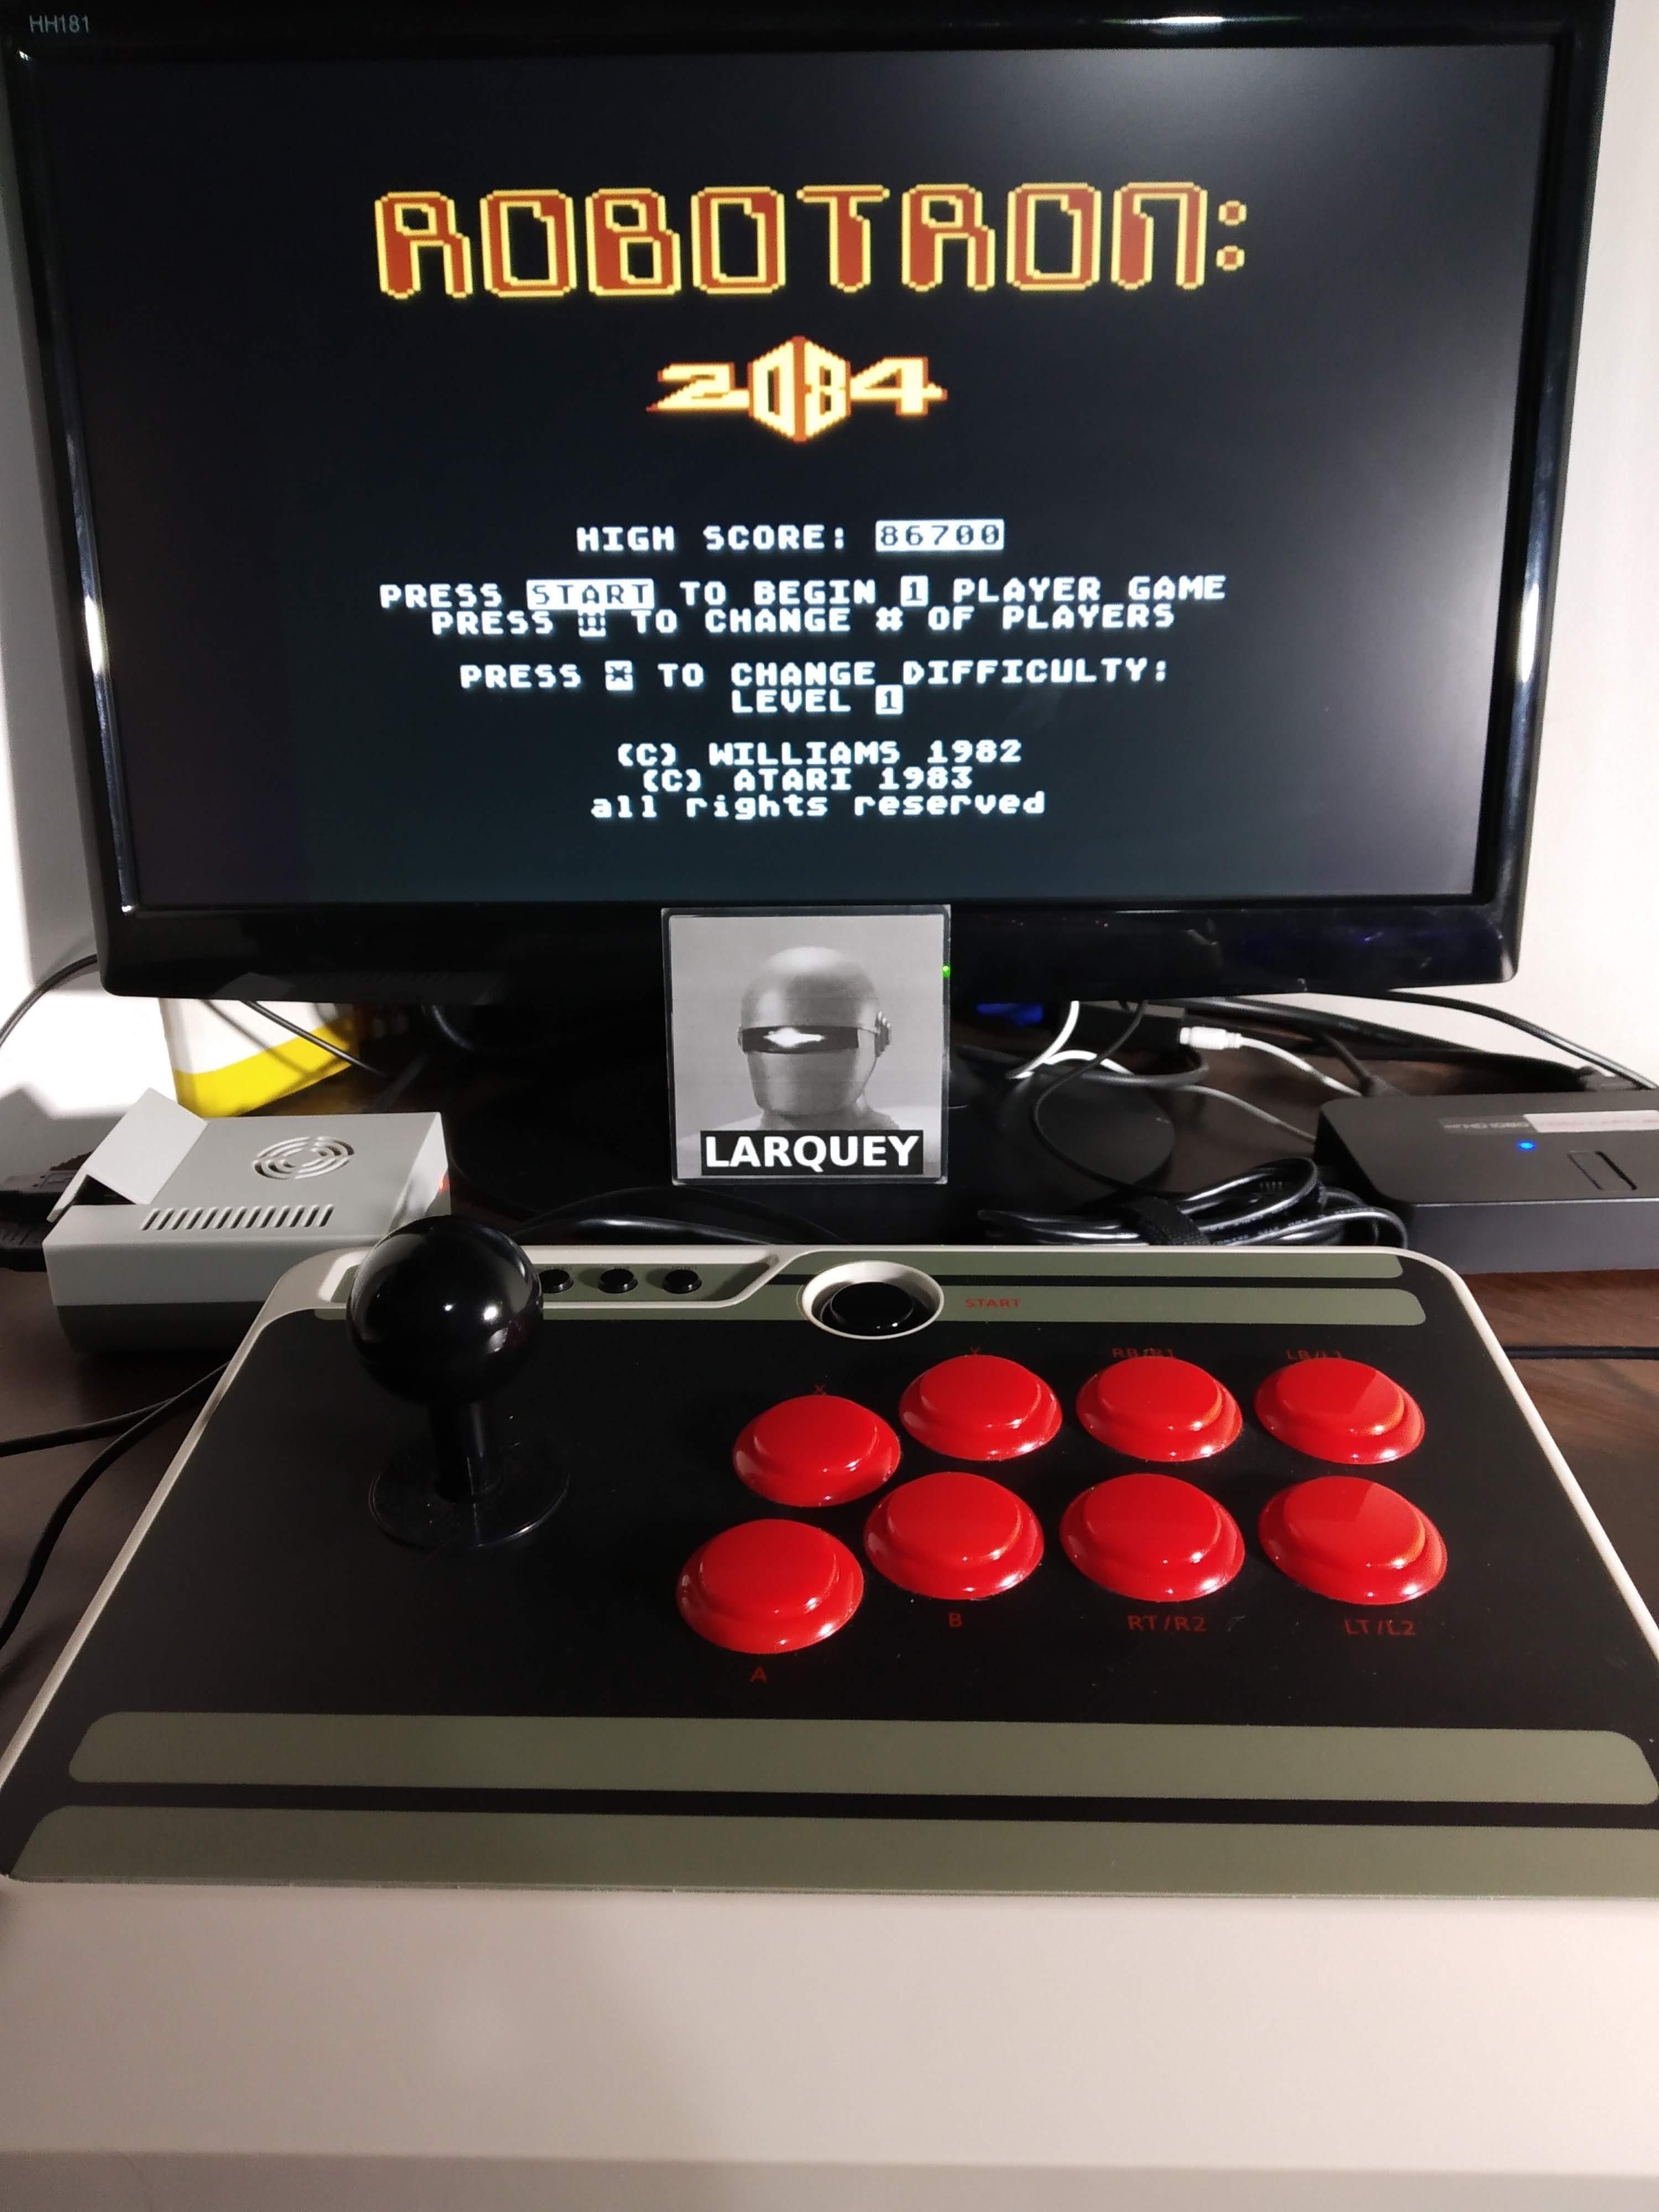 Larquey: Robotron 2084: Level 0 (Atari 5200 Emulated) 86,700 points on 2019-11-11 13:53:23